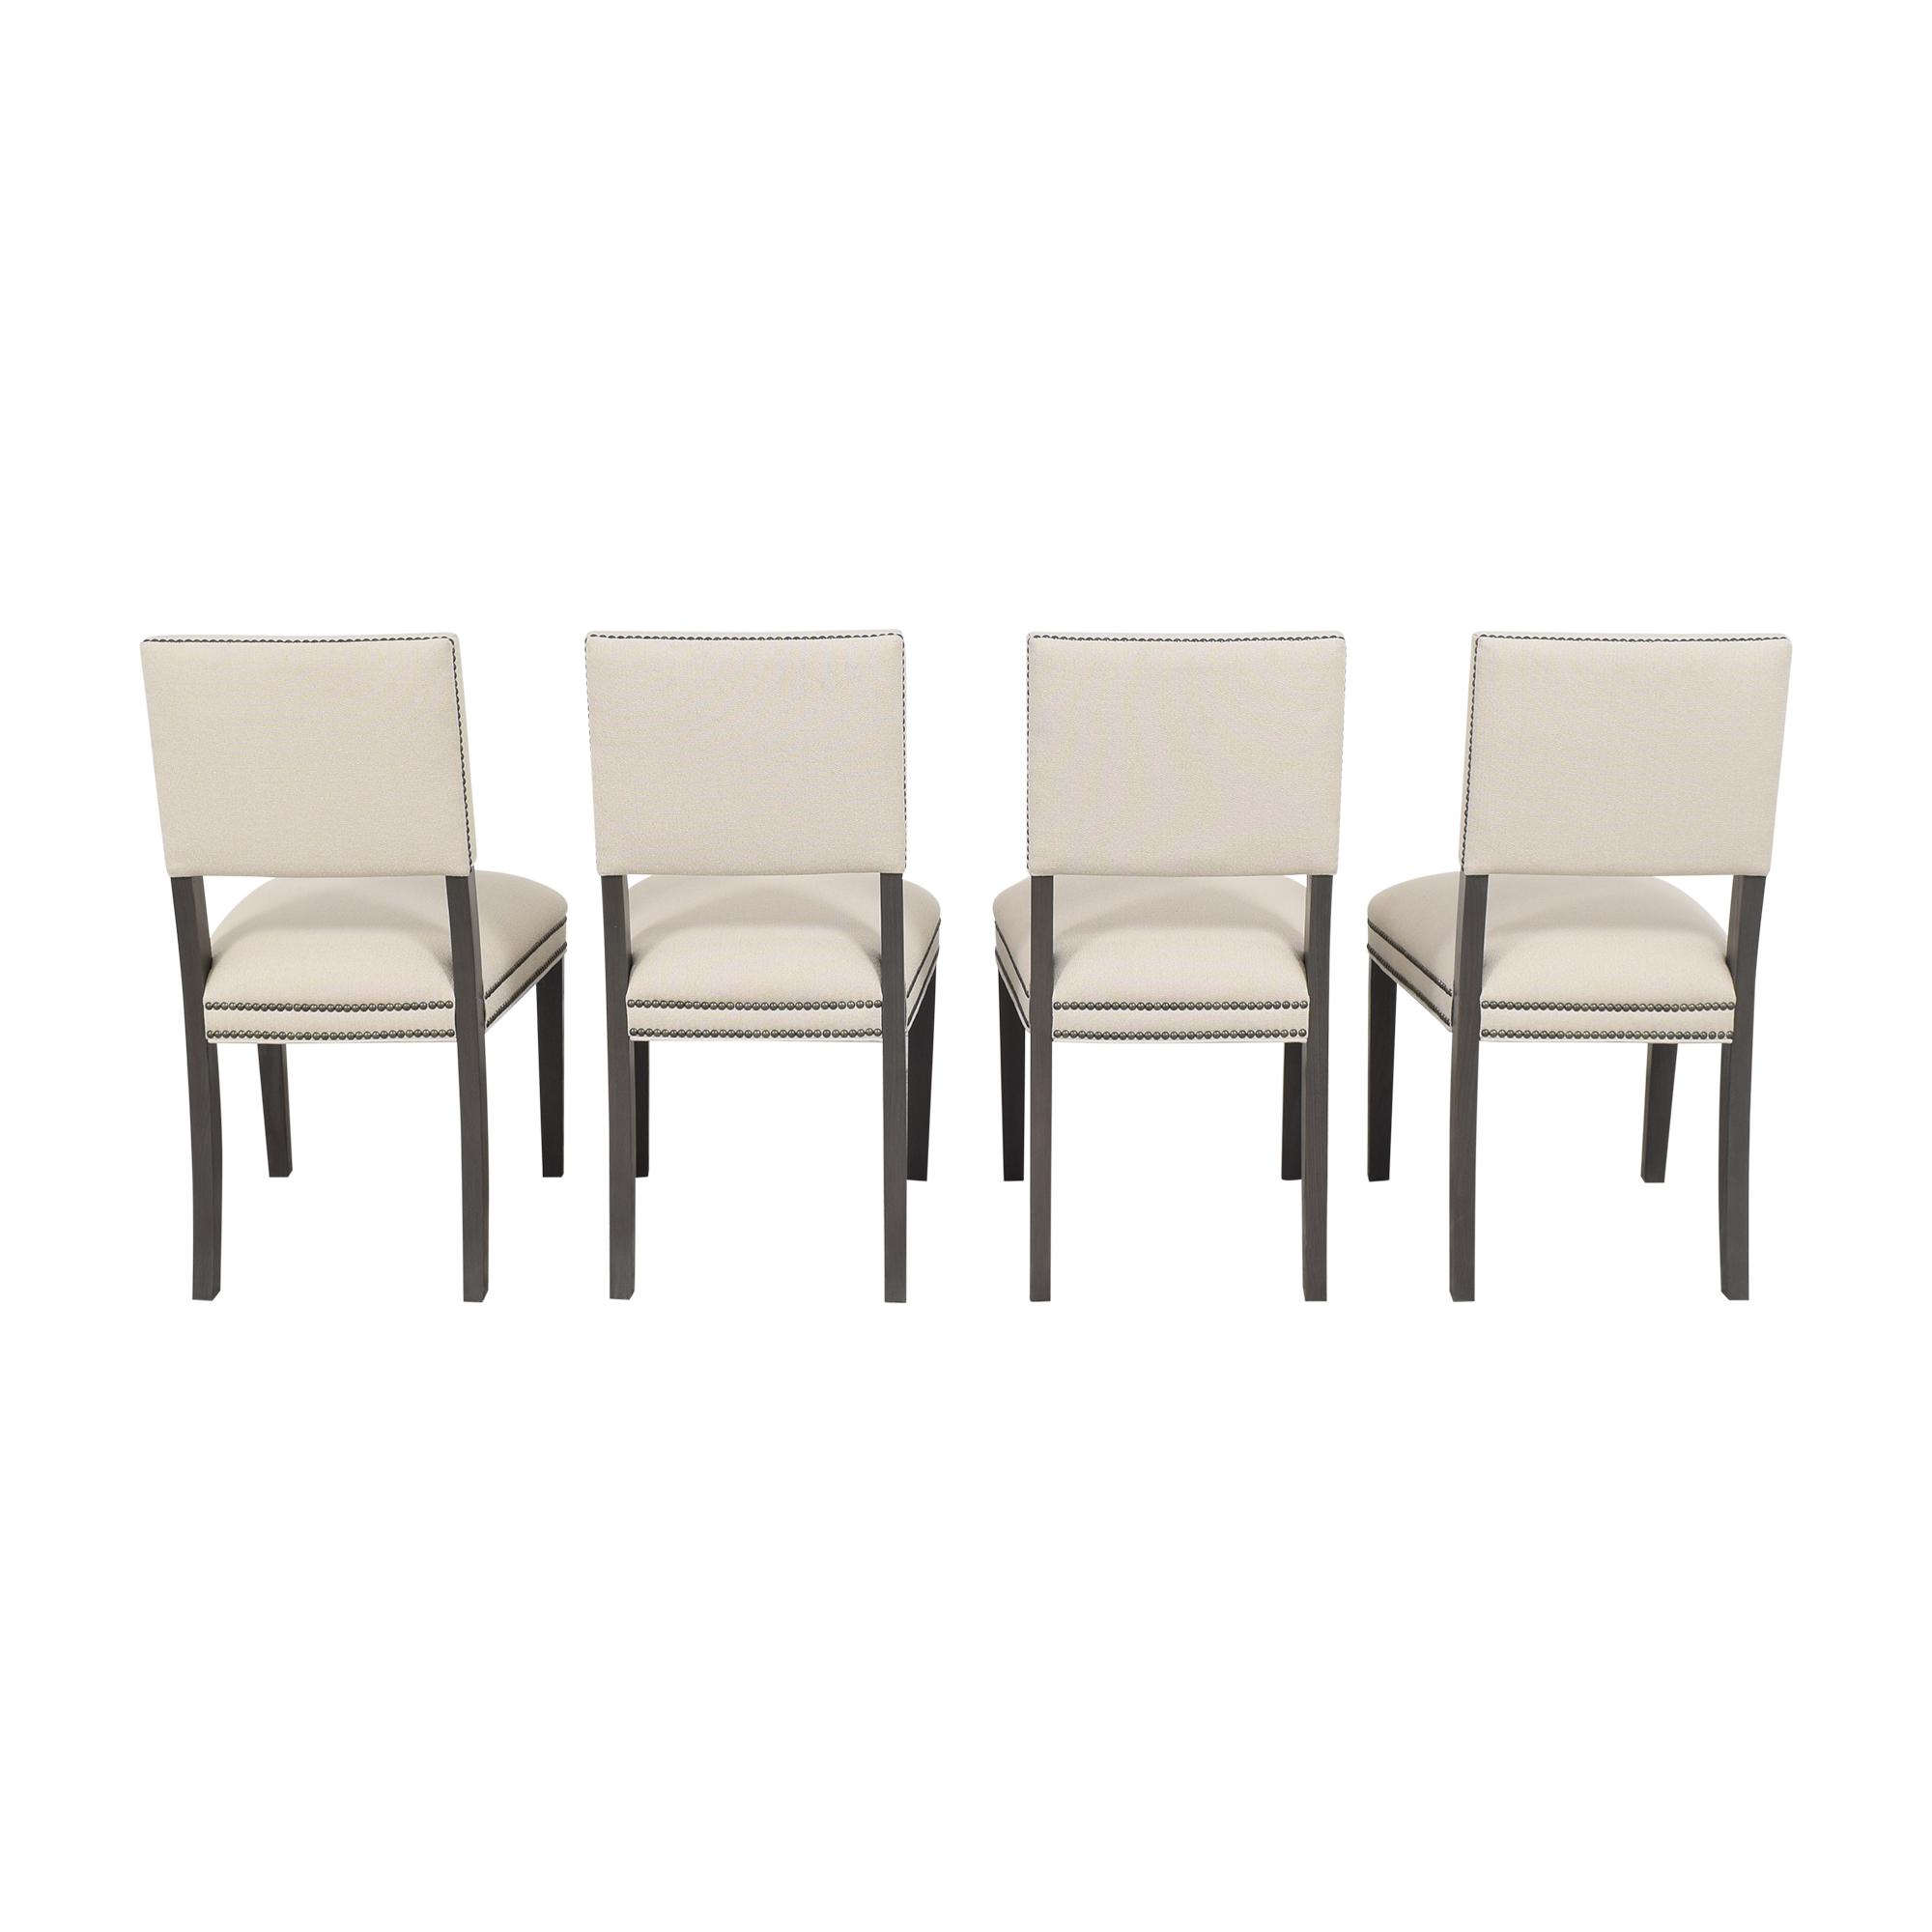 Vanguard Furniture Vanguard Furniture Newton Stocked Dining Chairs coupon